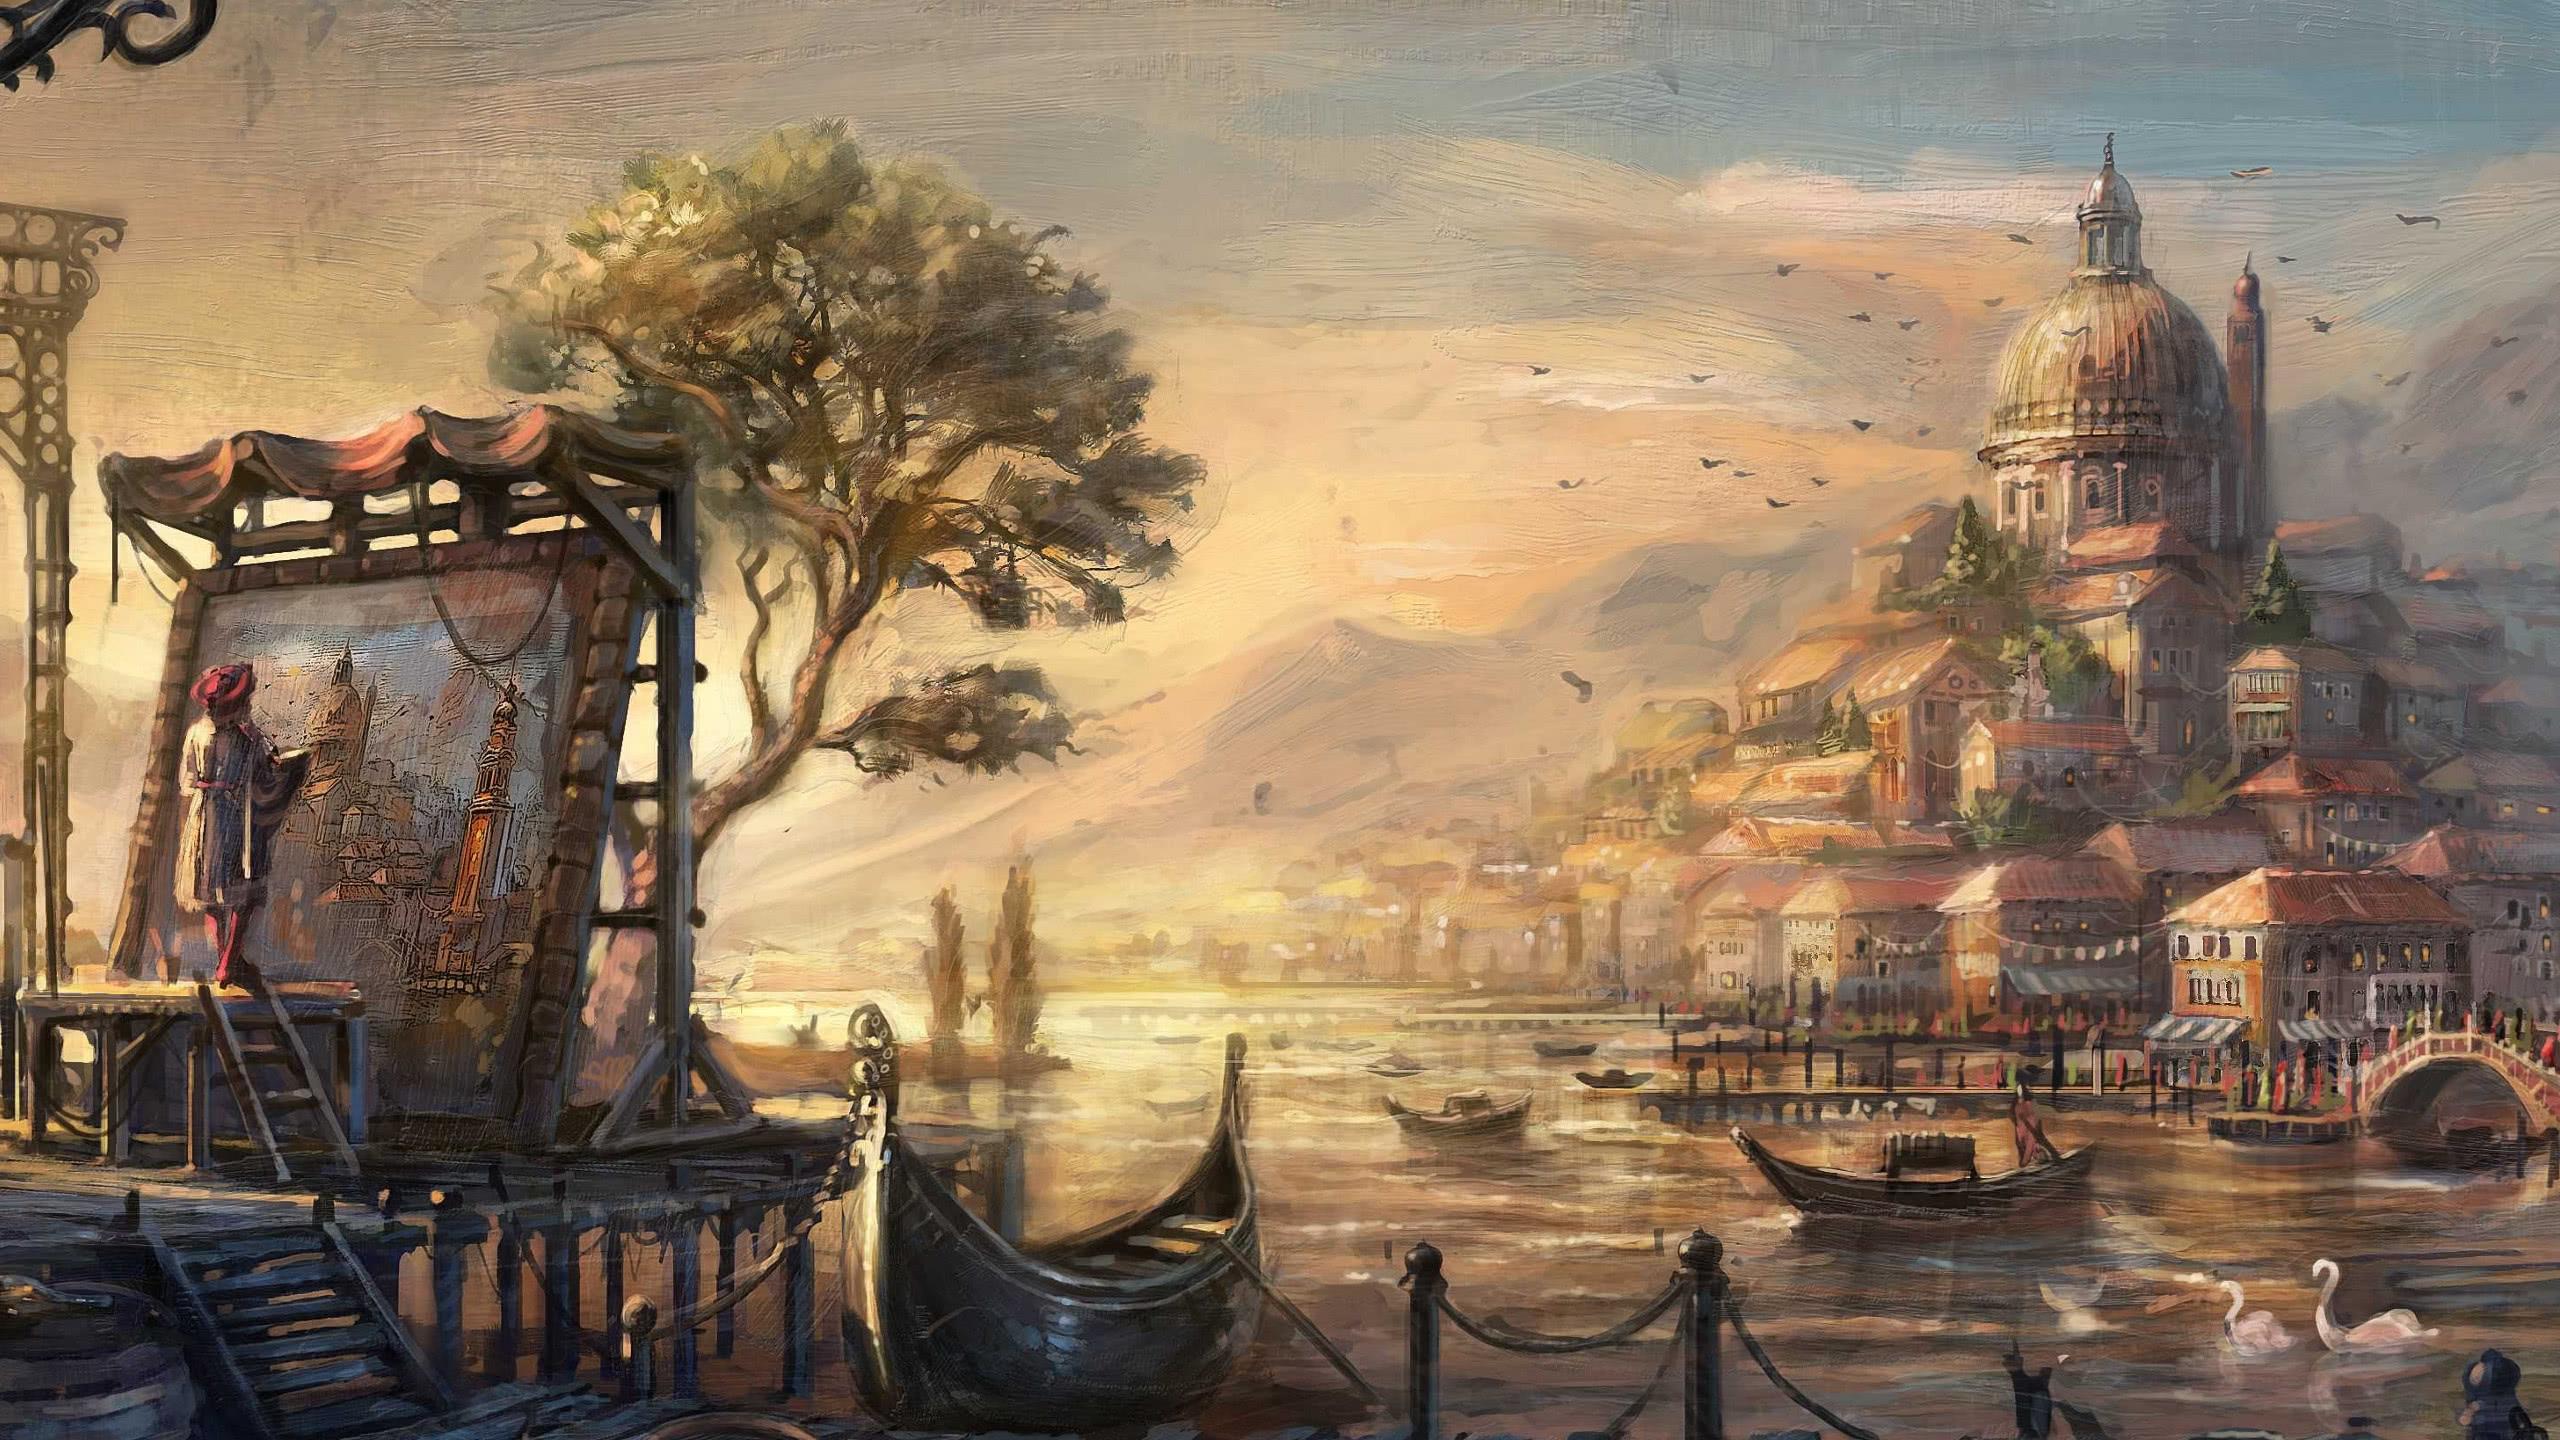 anno 1404 venice painting wqhd 1440p wallpaper